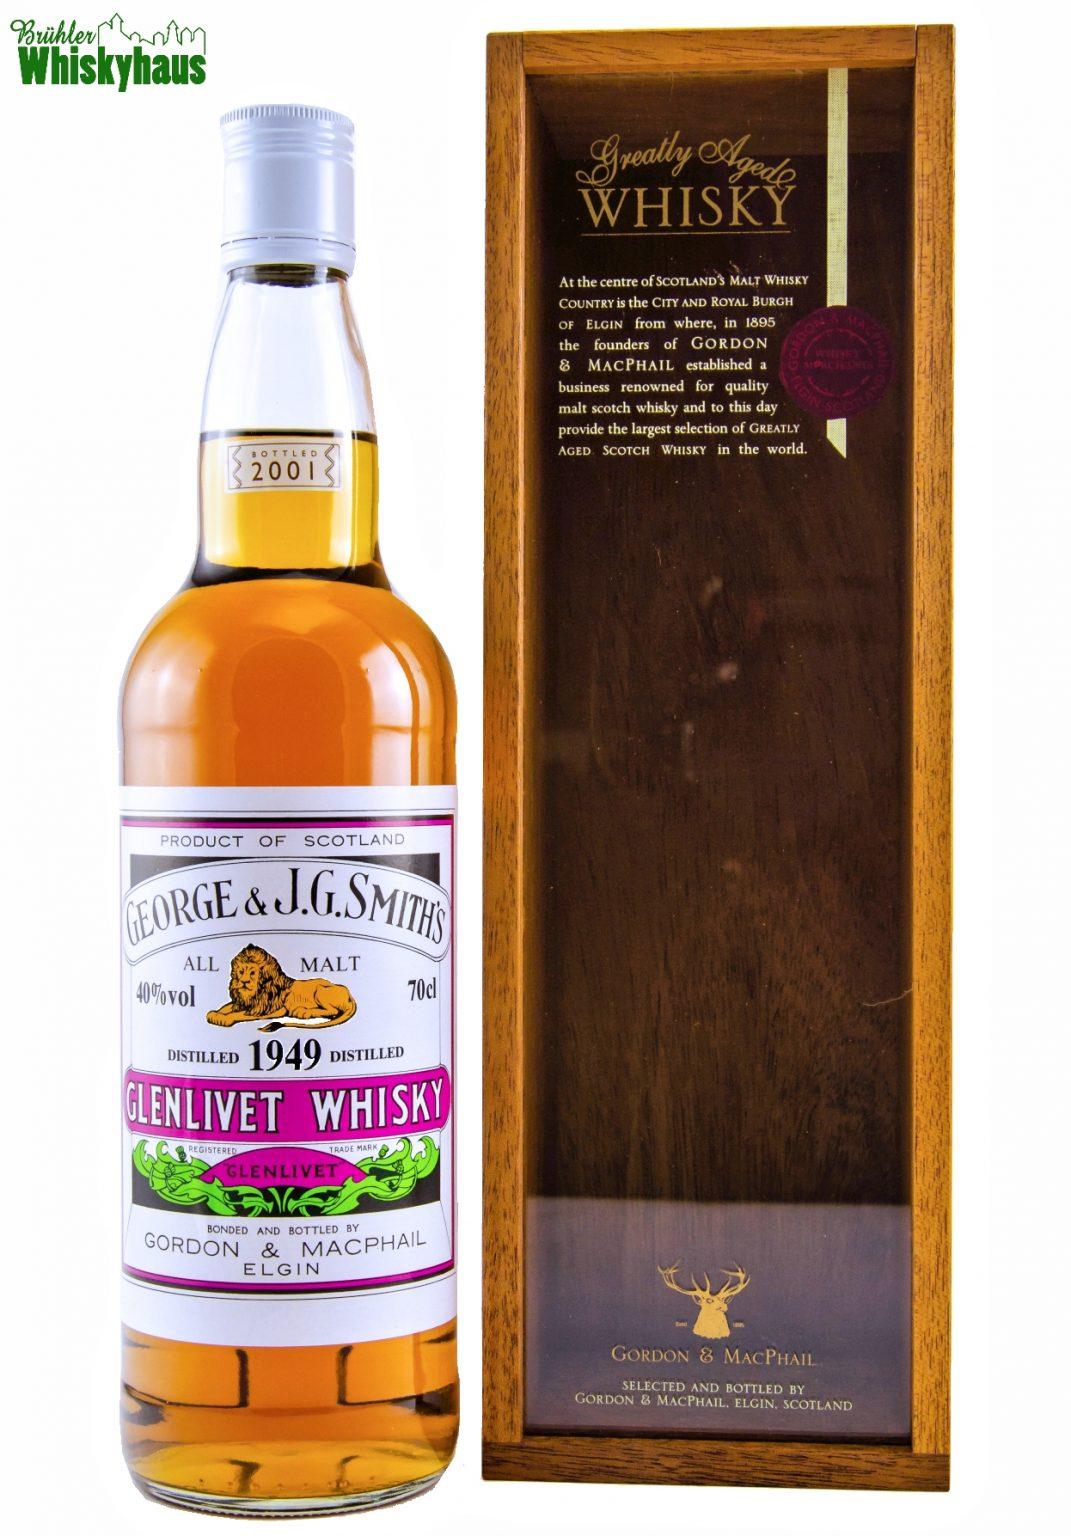 Glenlivet 52 Jahre - Vintage 1949 - George & J.G. Smith's - Rare Vintage Serie by Gordon & MacPhail - Single Malt Scotch Whisky